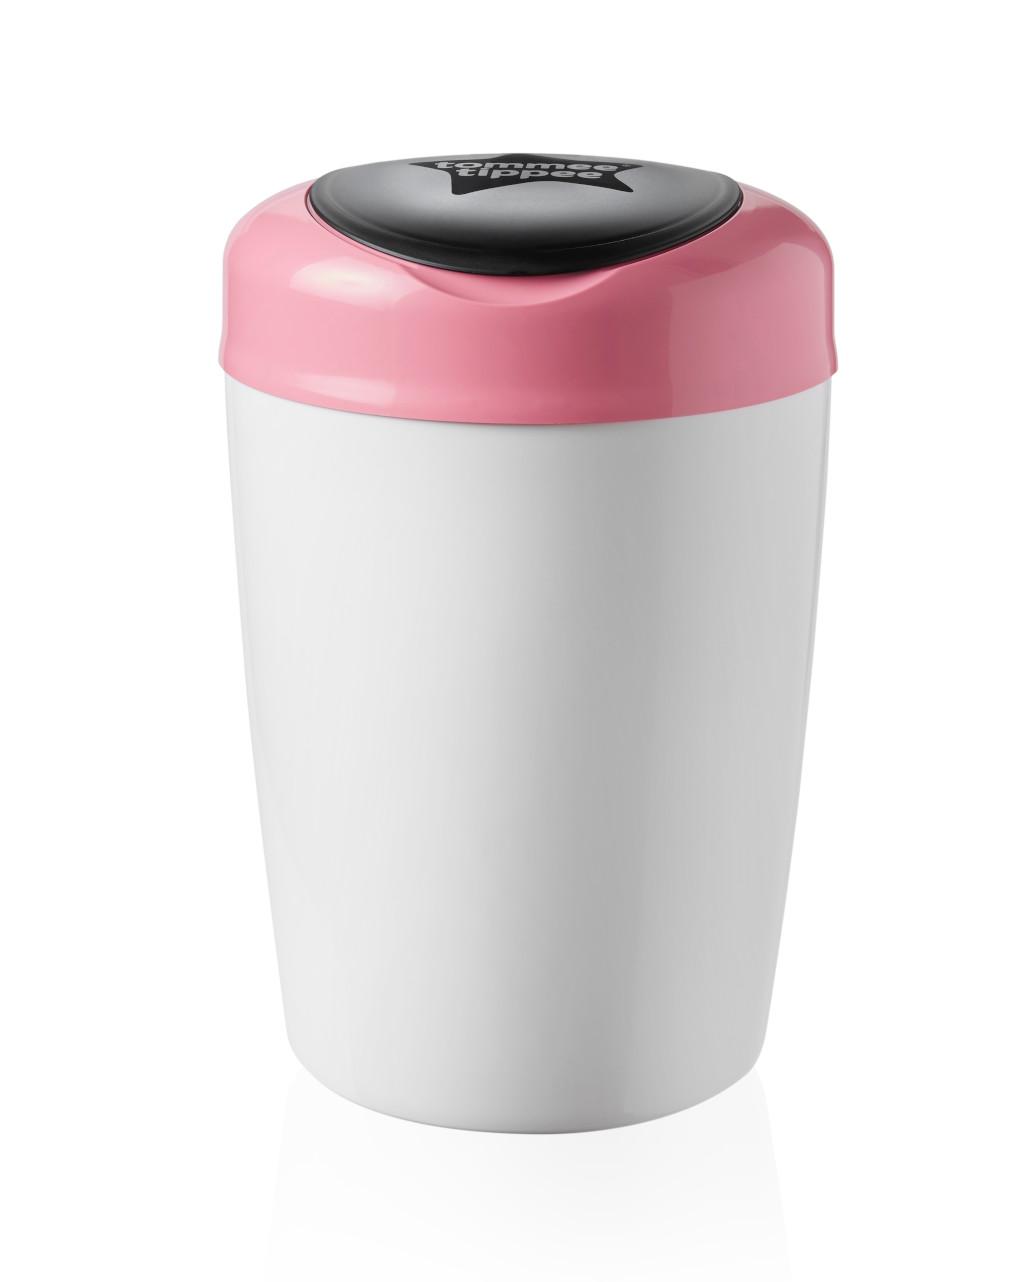 Tommee tippee sangenic simplee sistema di smaltimento pannolini, rosa - Sangenic